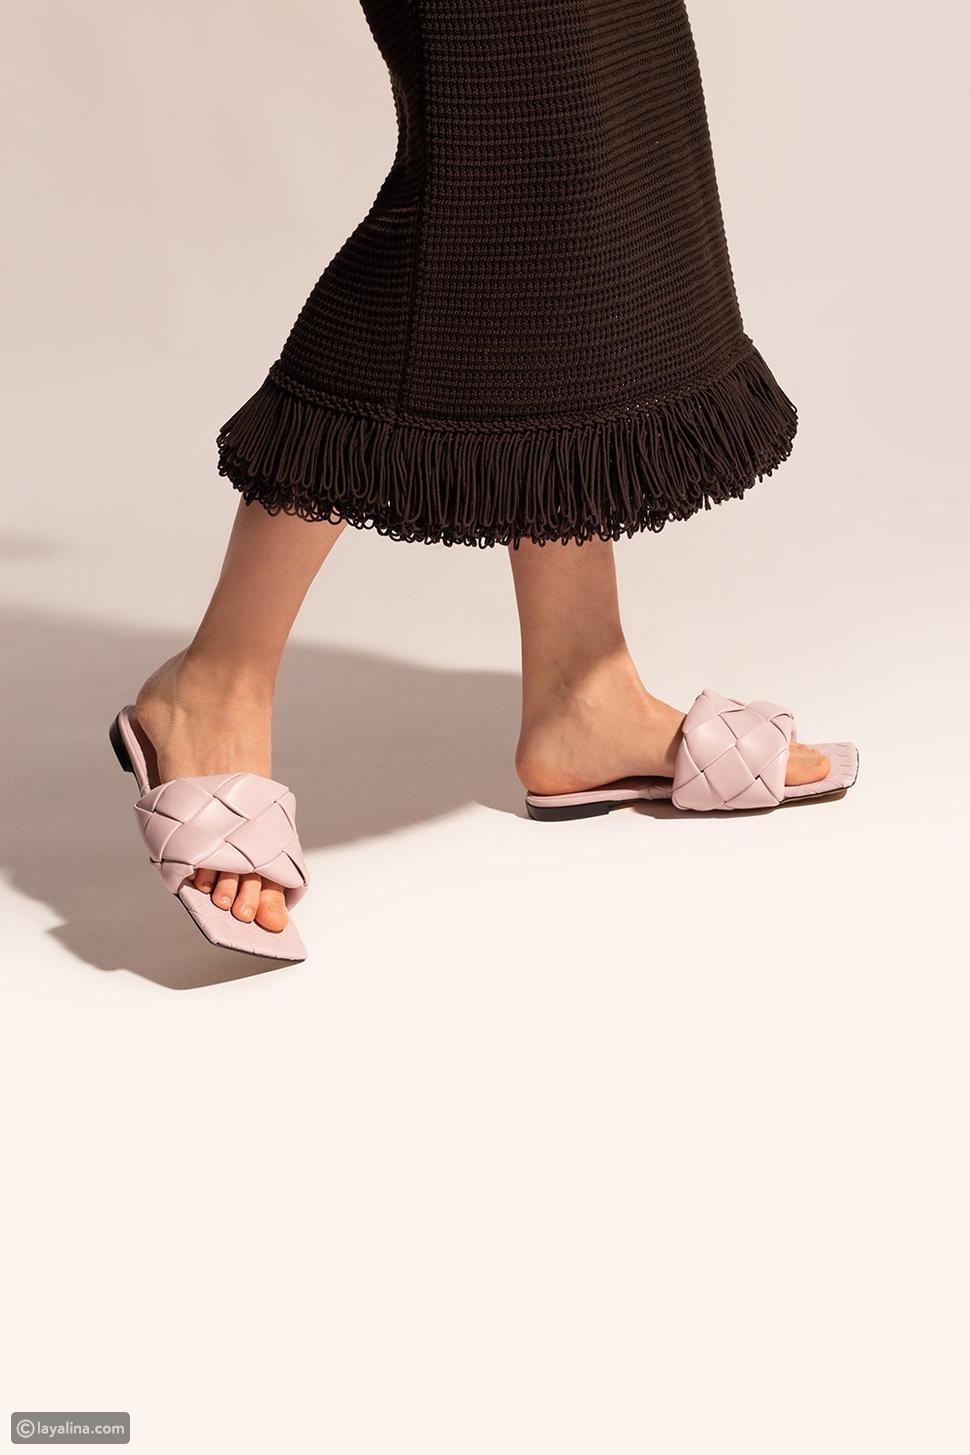 صنادل بتصميم مربعSquare Toes